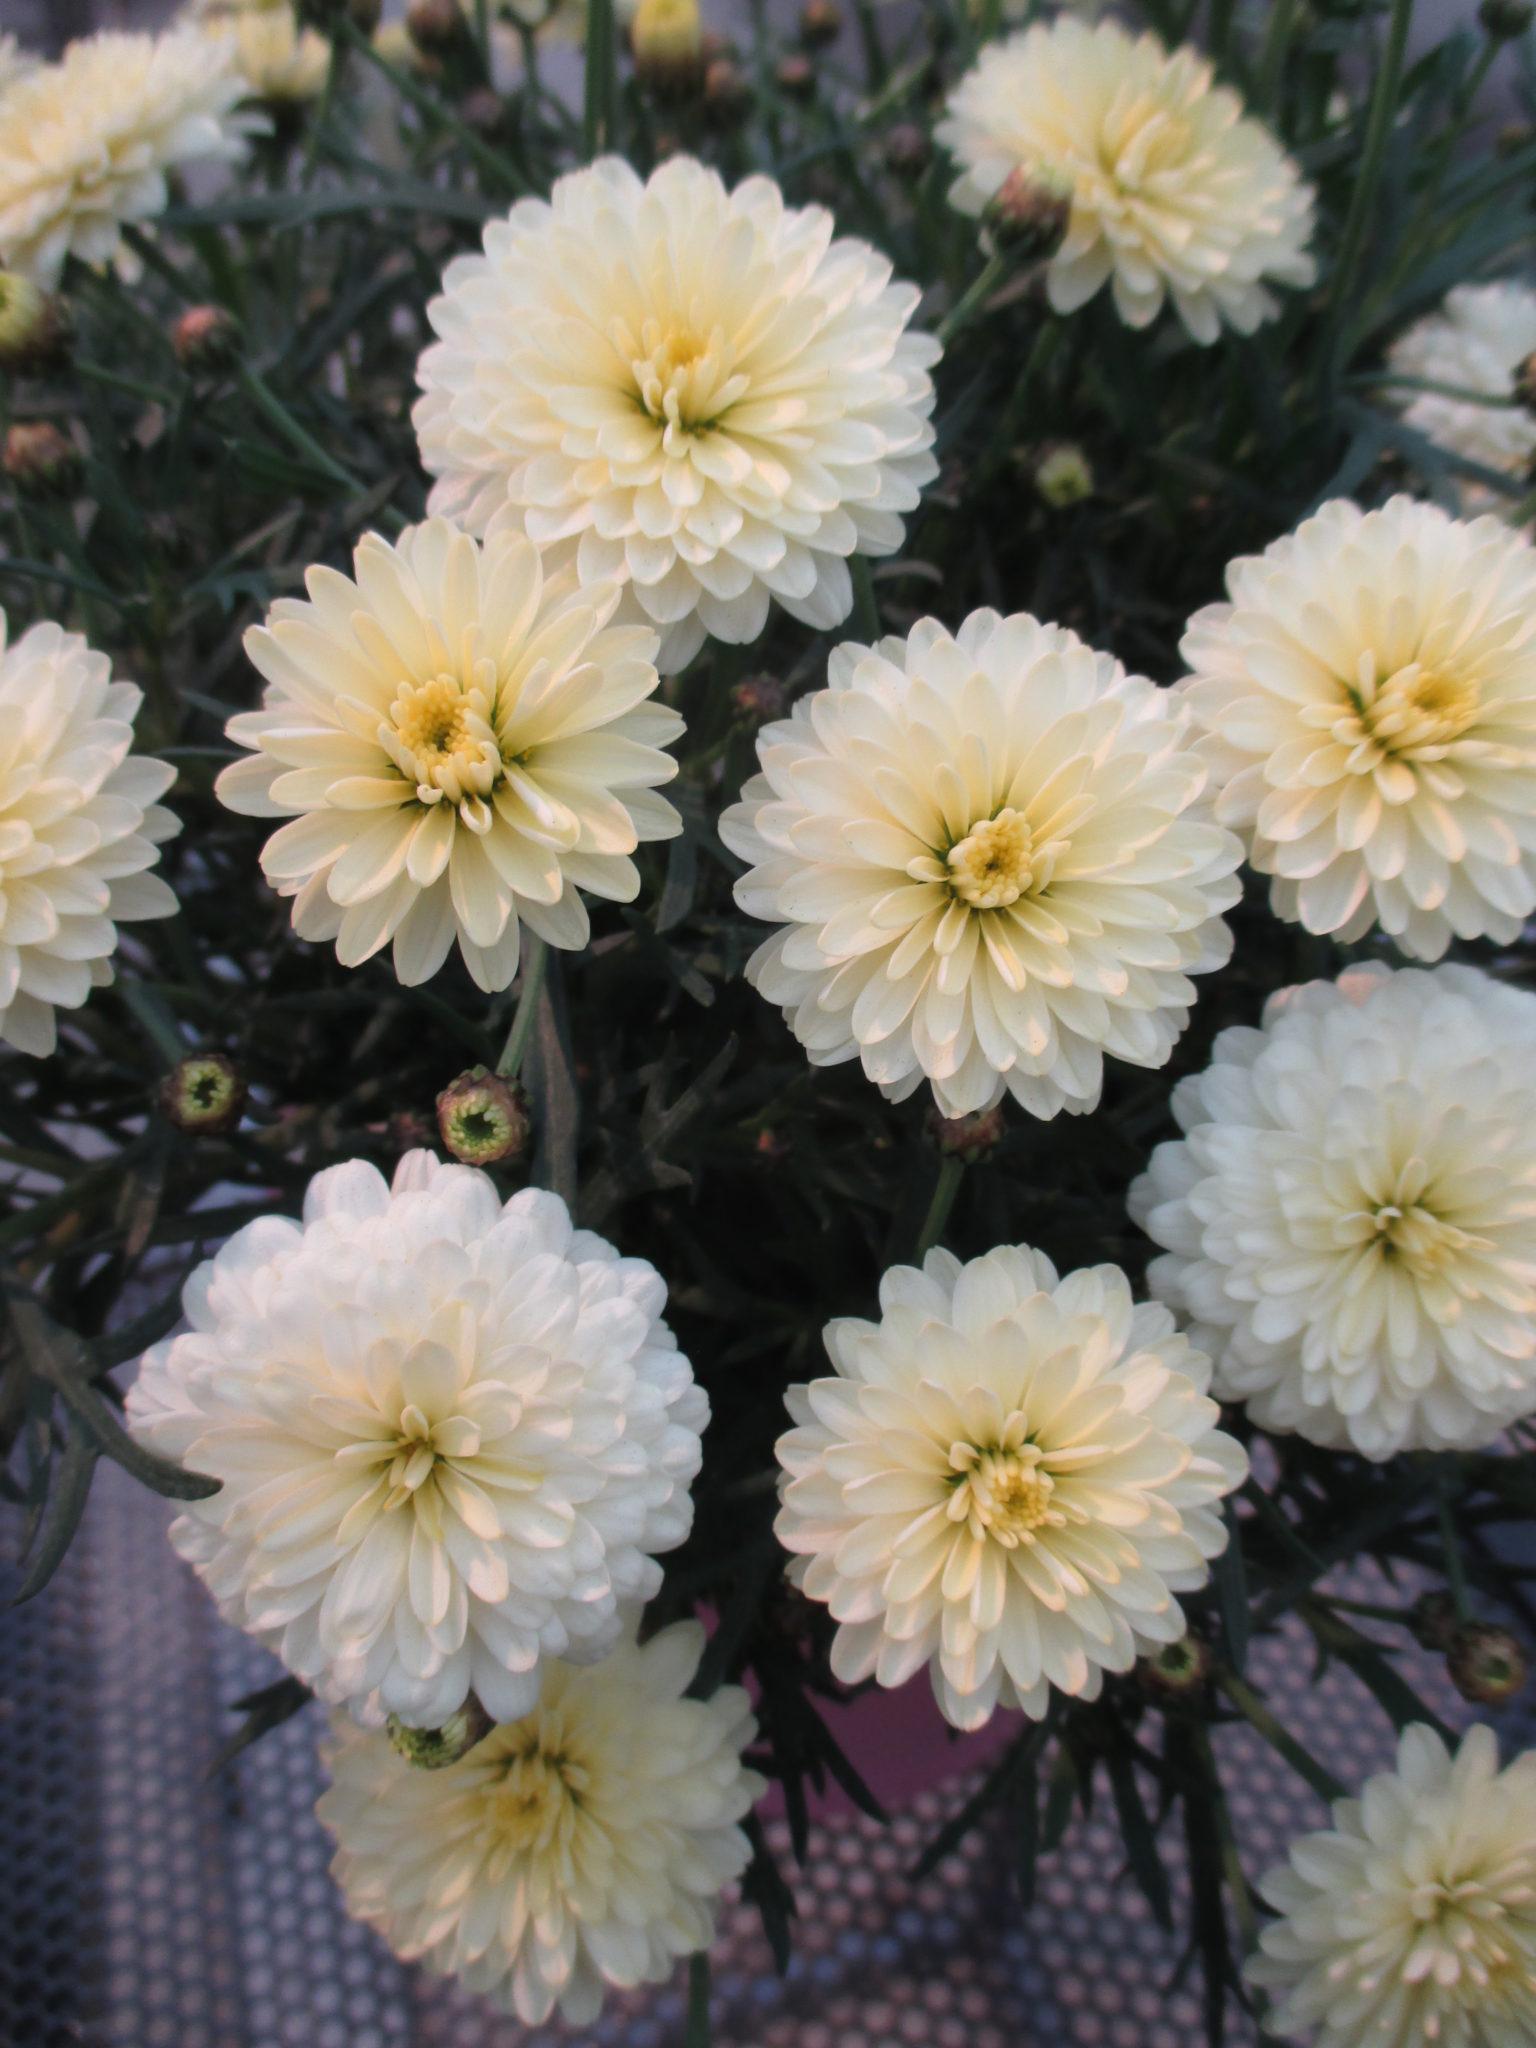 Argyranthemum day zee double vanilla 2016 jpg rotary botanical gardens argyranthemum day zee double vanilla 2016 jpg izmirmasajfo